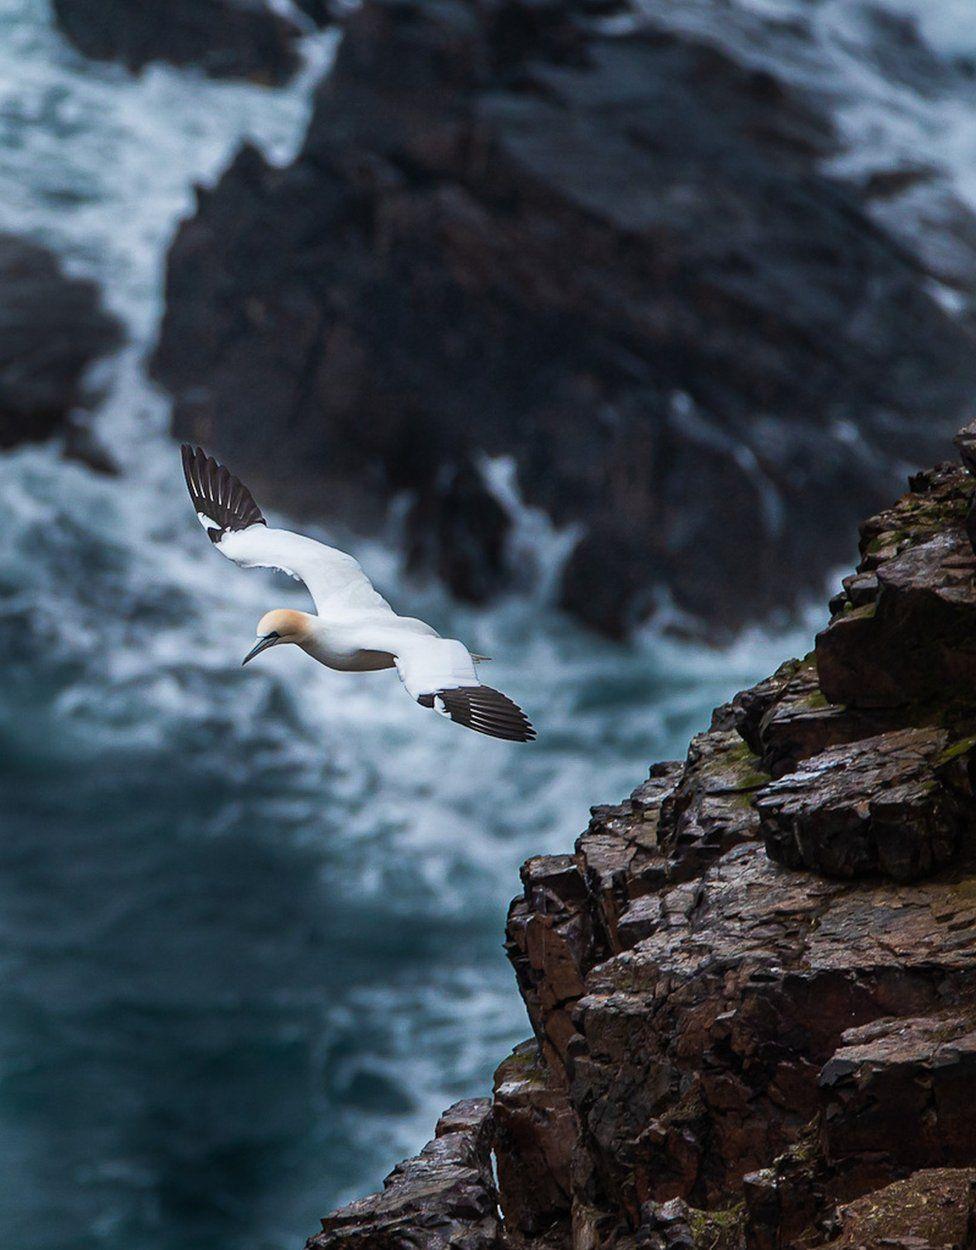 Gannet flying near cliffs